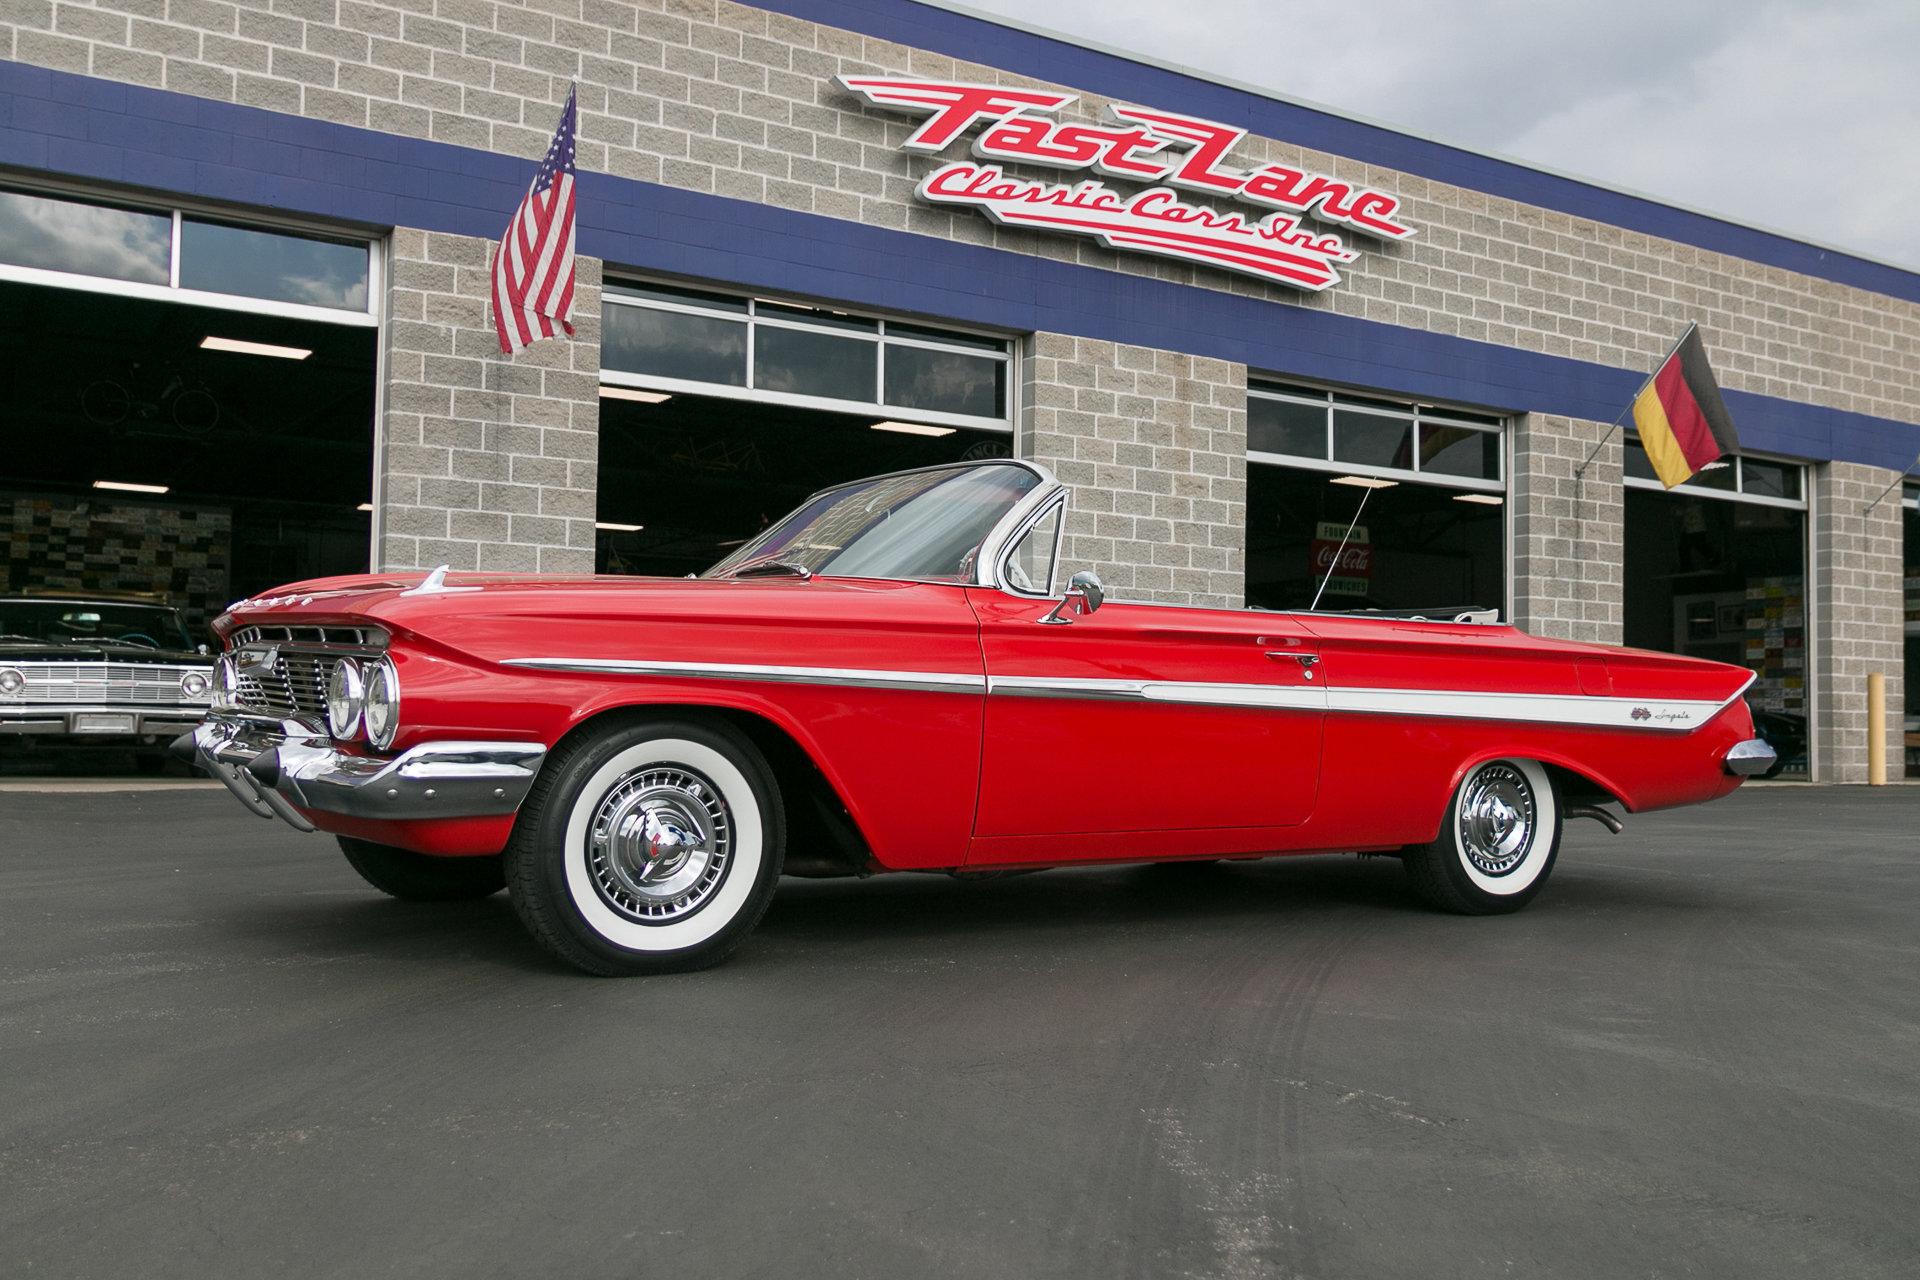 1961 Chevrolet Impala | Fast Lane Clic Cars